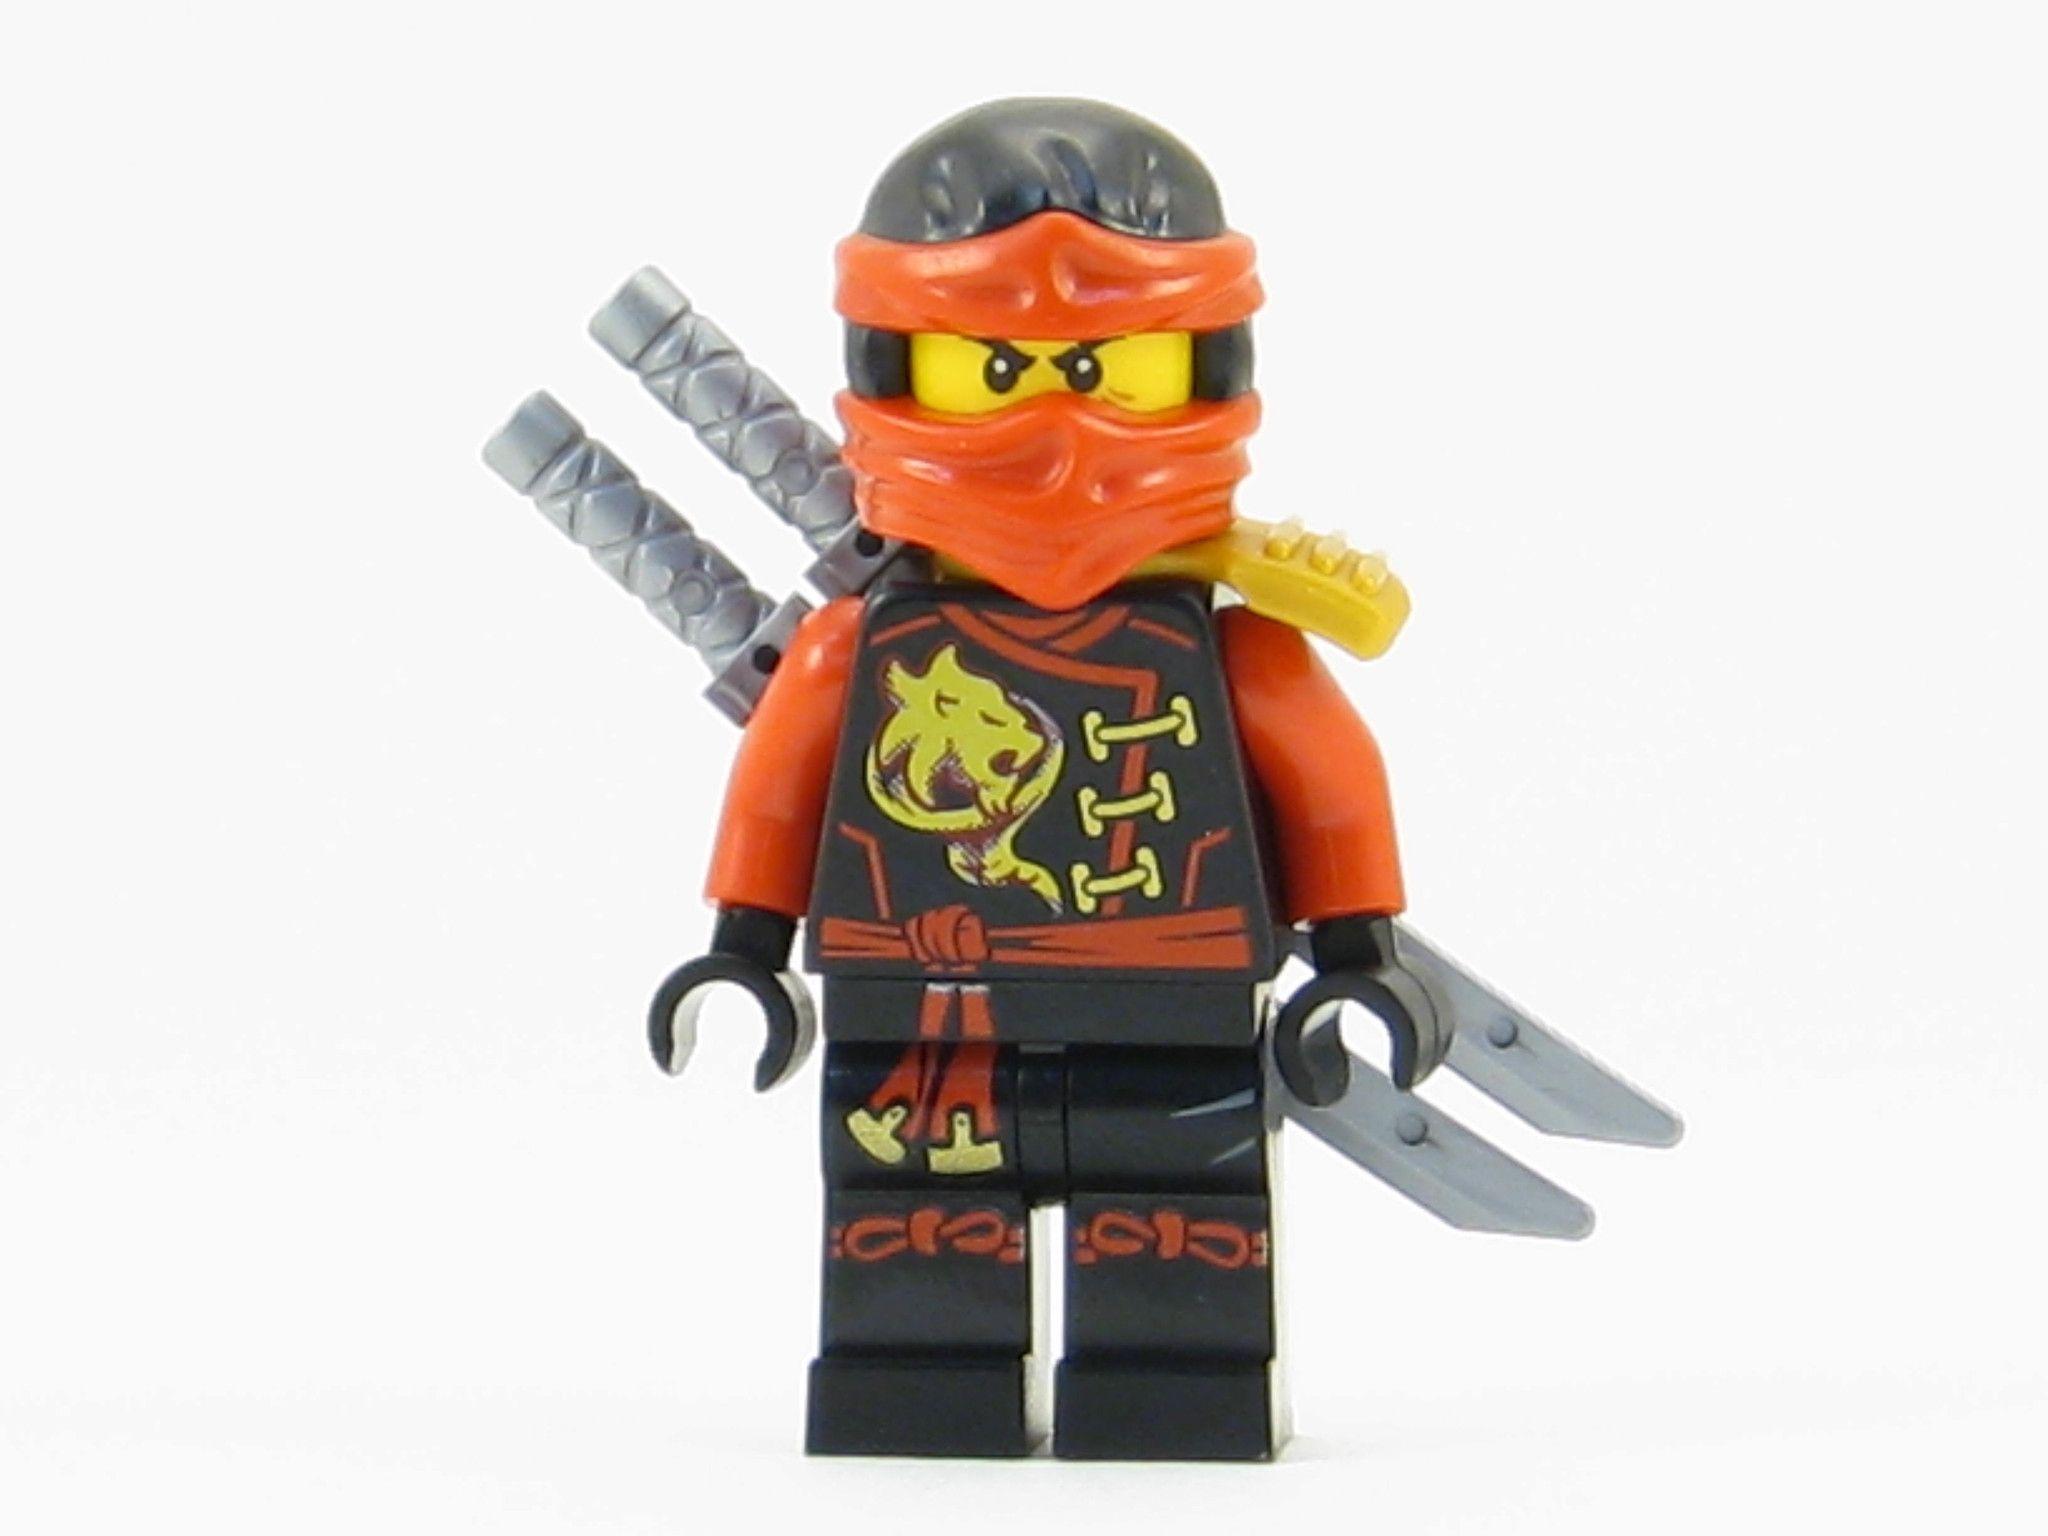 Lego ninjago skybound kai red ninja minifigure sky pirate - Ninjago lego kai ...